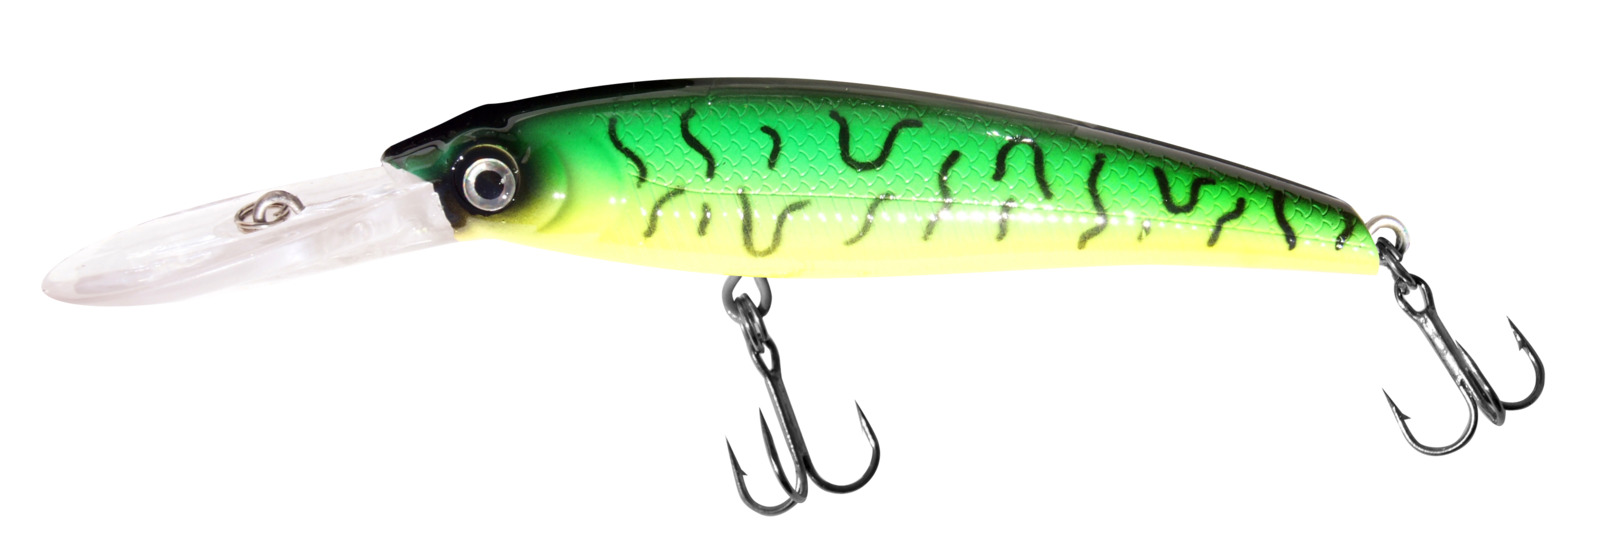 Воблер Siweida Deep Runner Minnow, 0059595, зеленый, желтый, черный (27), 140 мм, 50 г цены